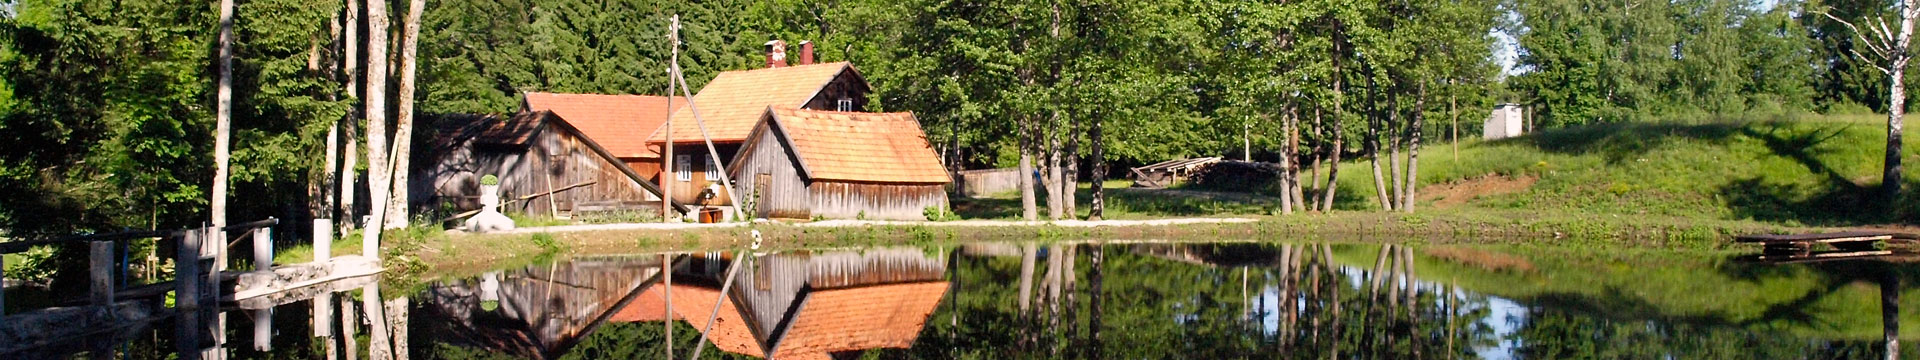 Camping Gorski Kotar  | AdriaCamps